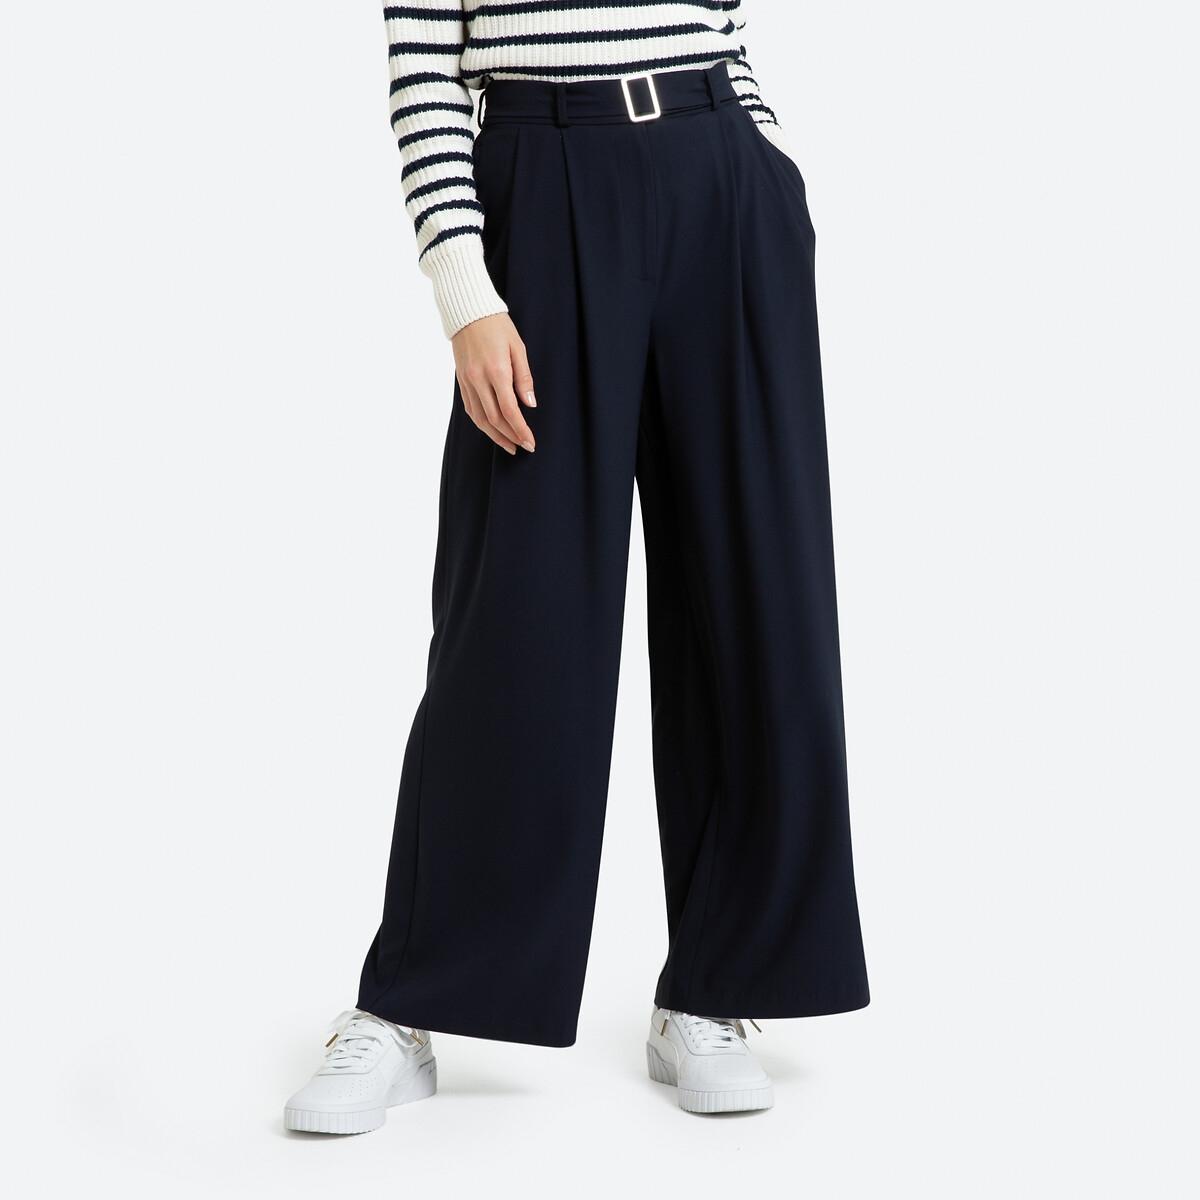 Pantalon extra large, avec ceinture